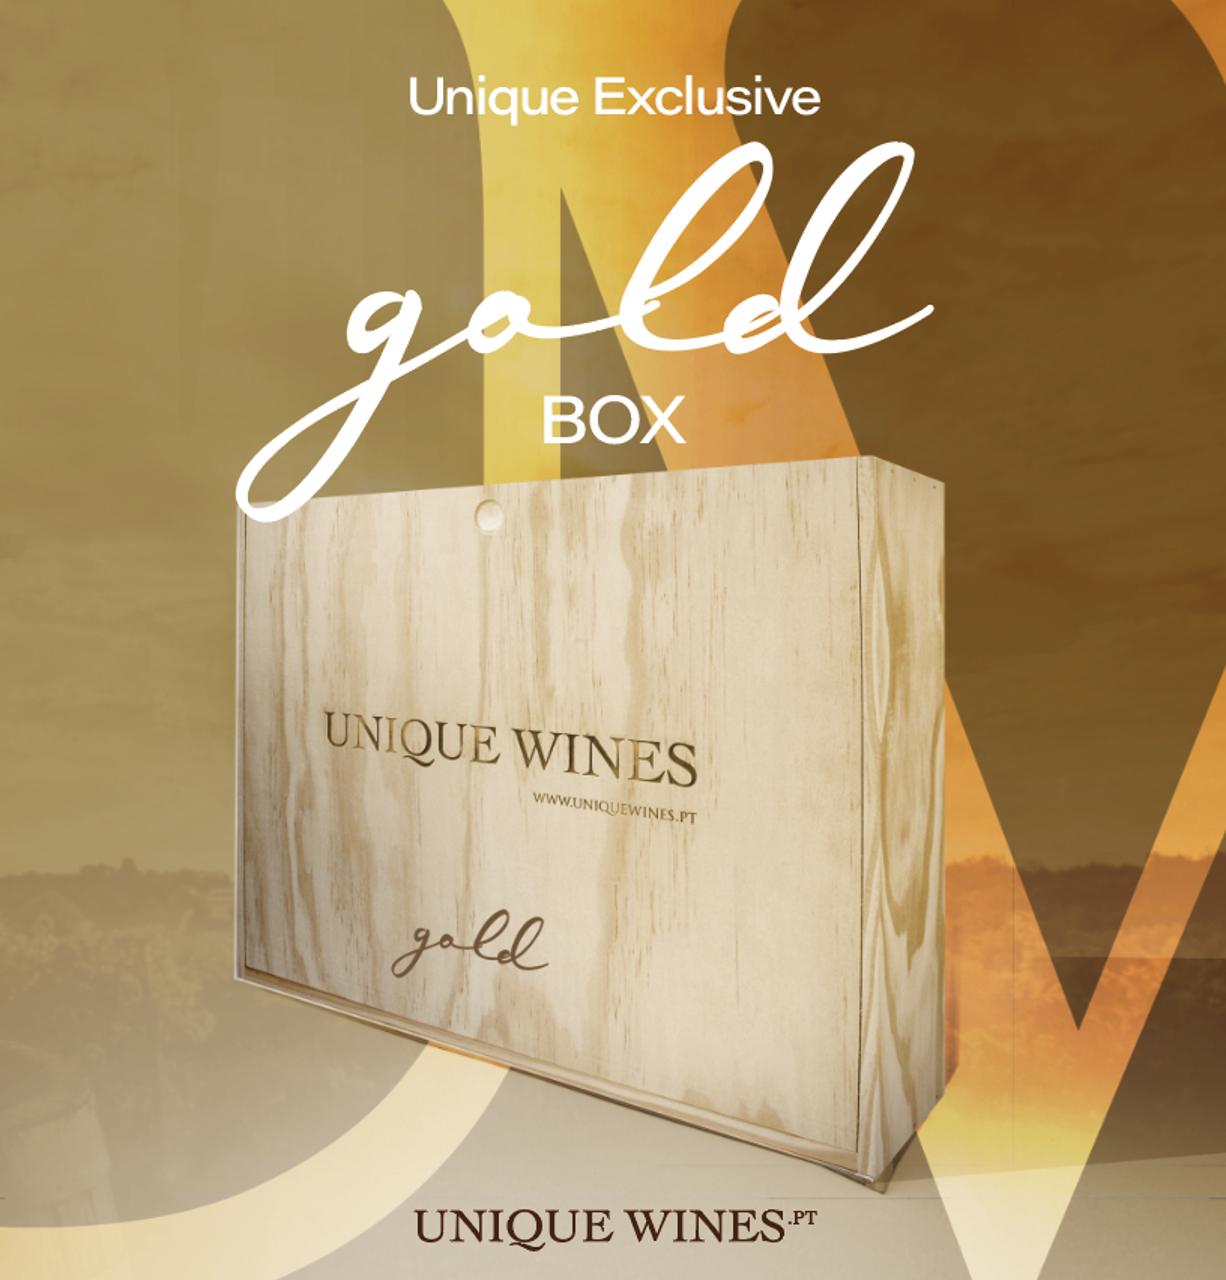 Picture of Unique Exclusive GOLD Box